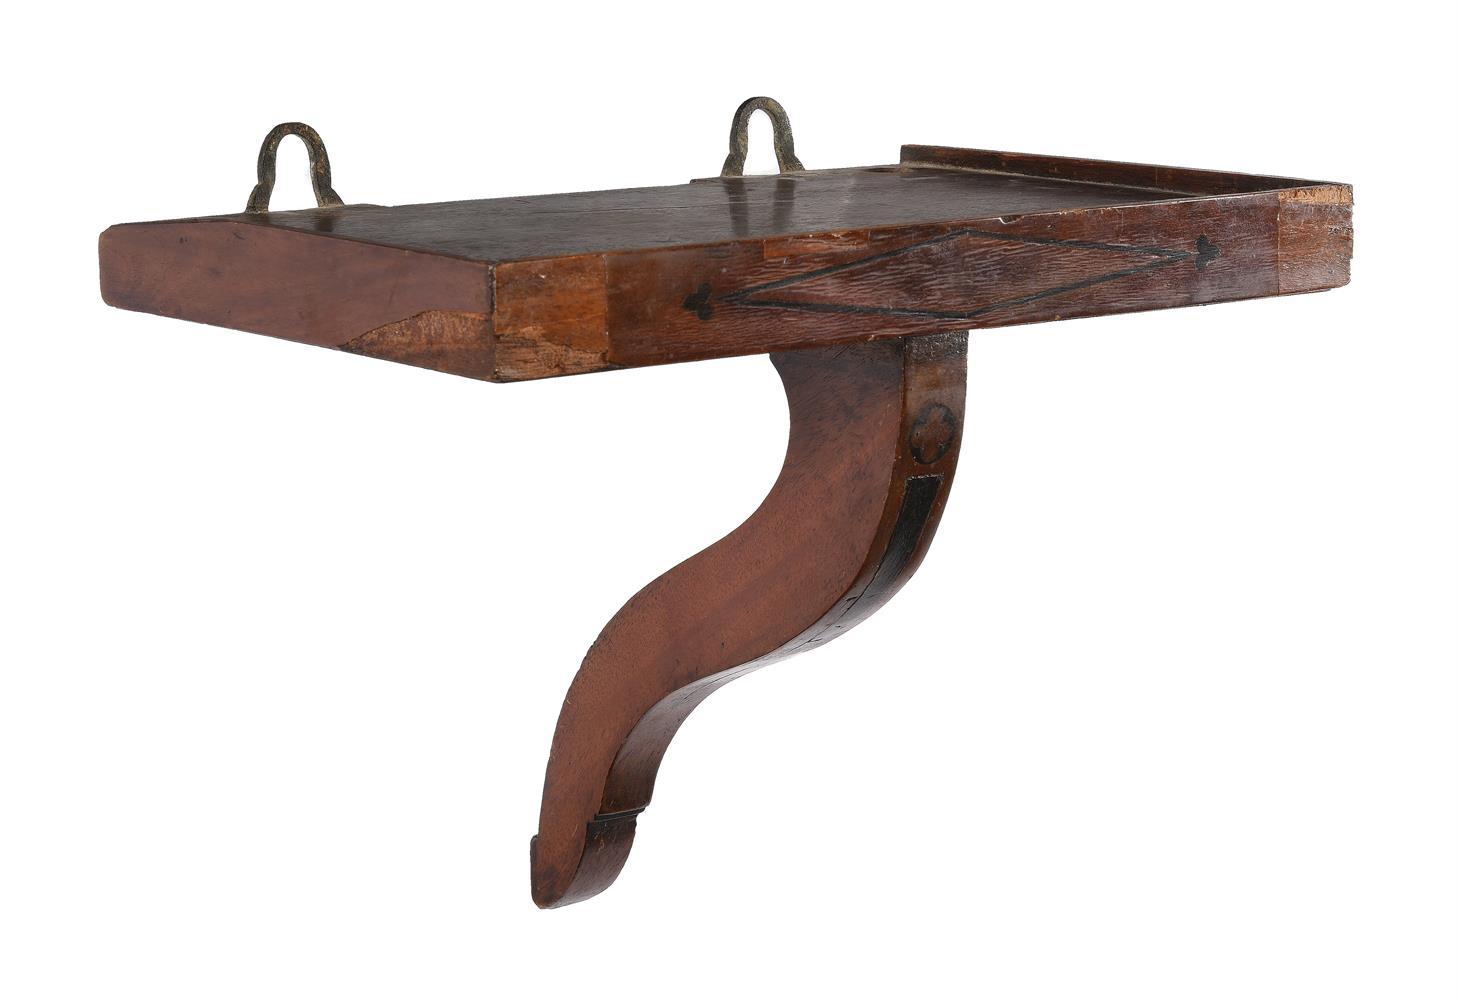 A RARE GEORGE II PROVINCIAL MAHOGANY TABLE CLOCK - Image 3 of 3